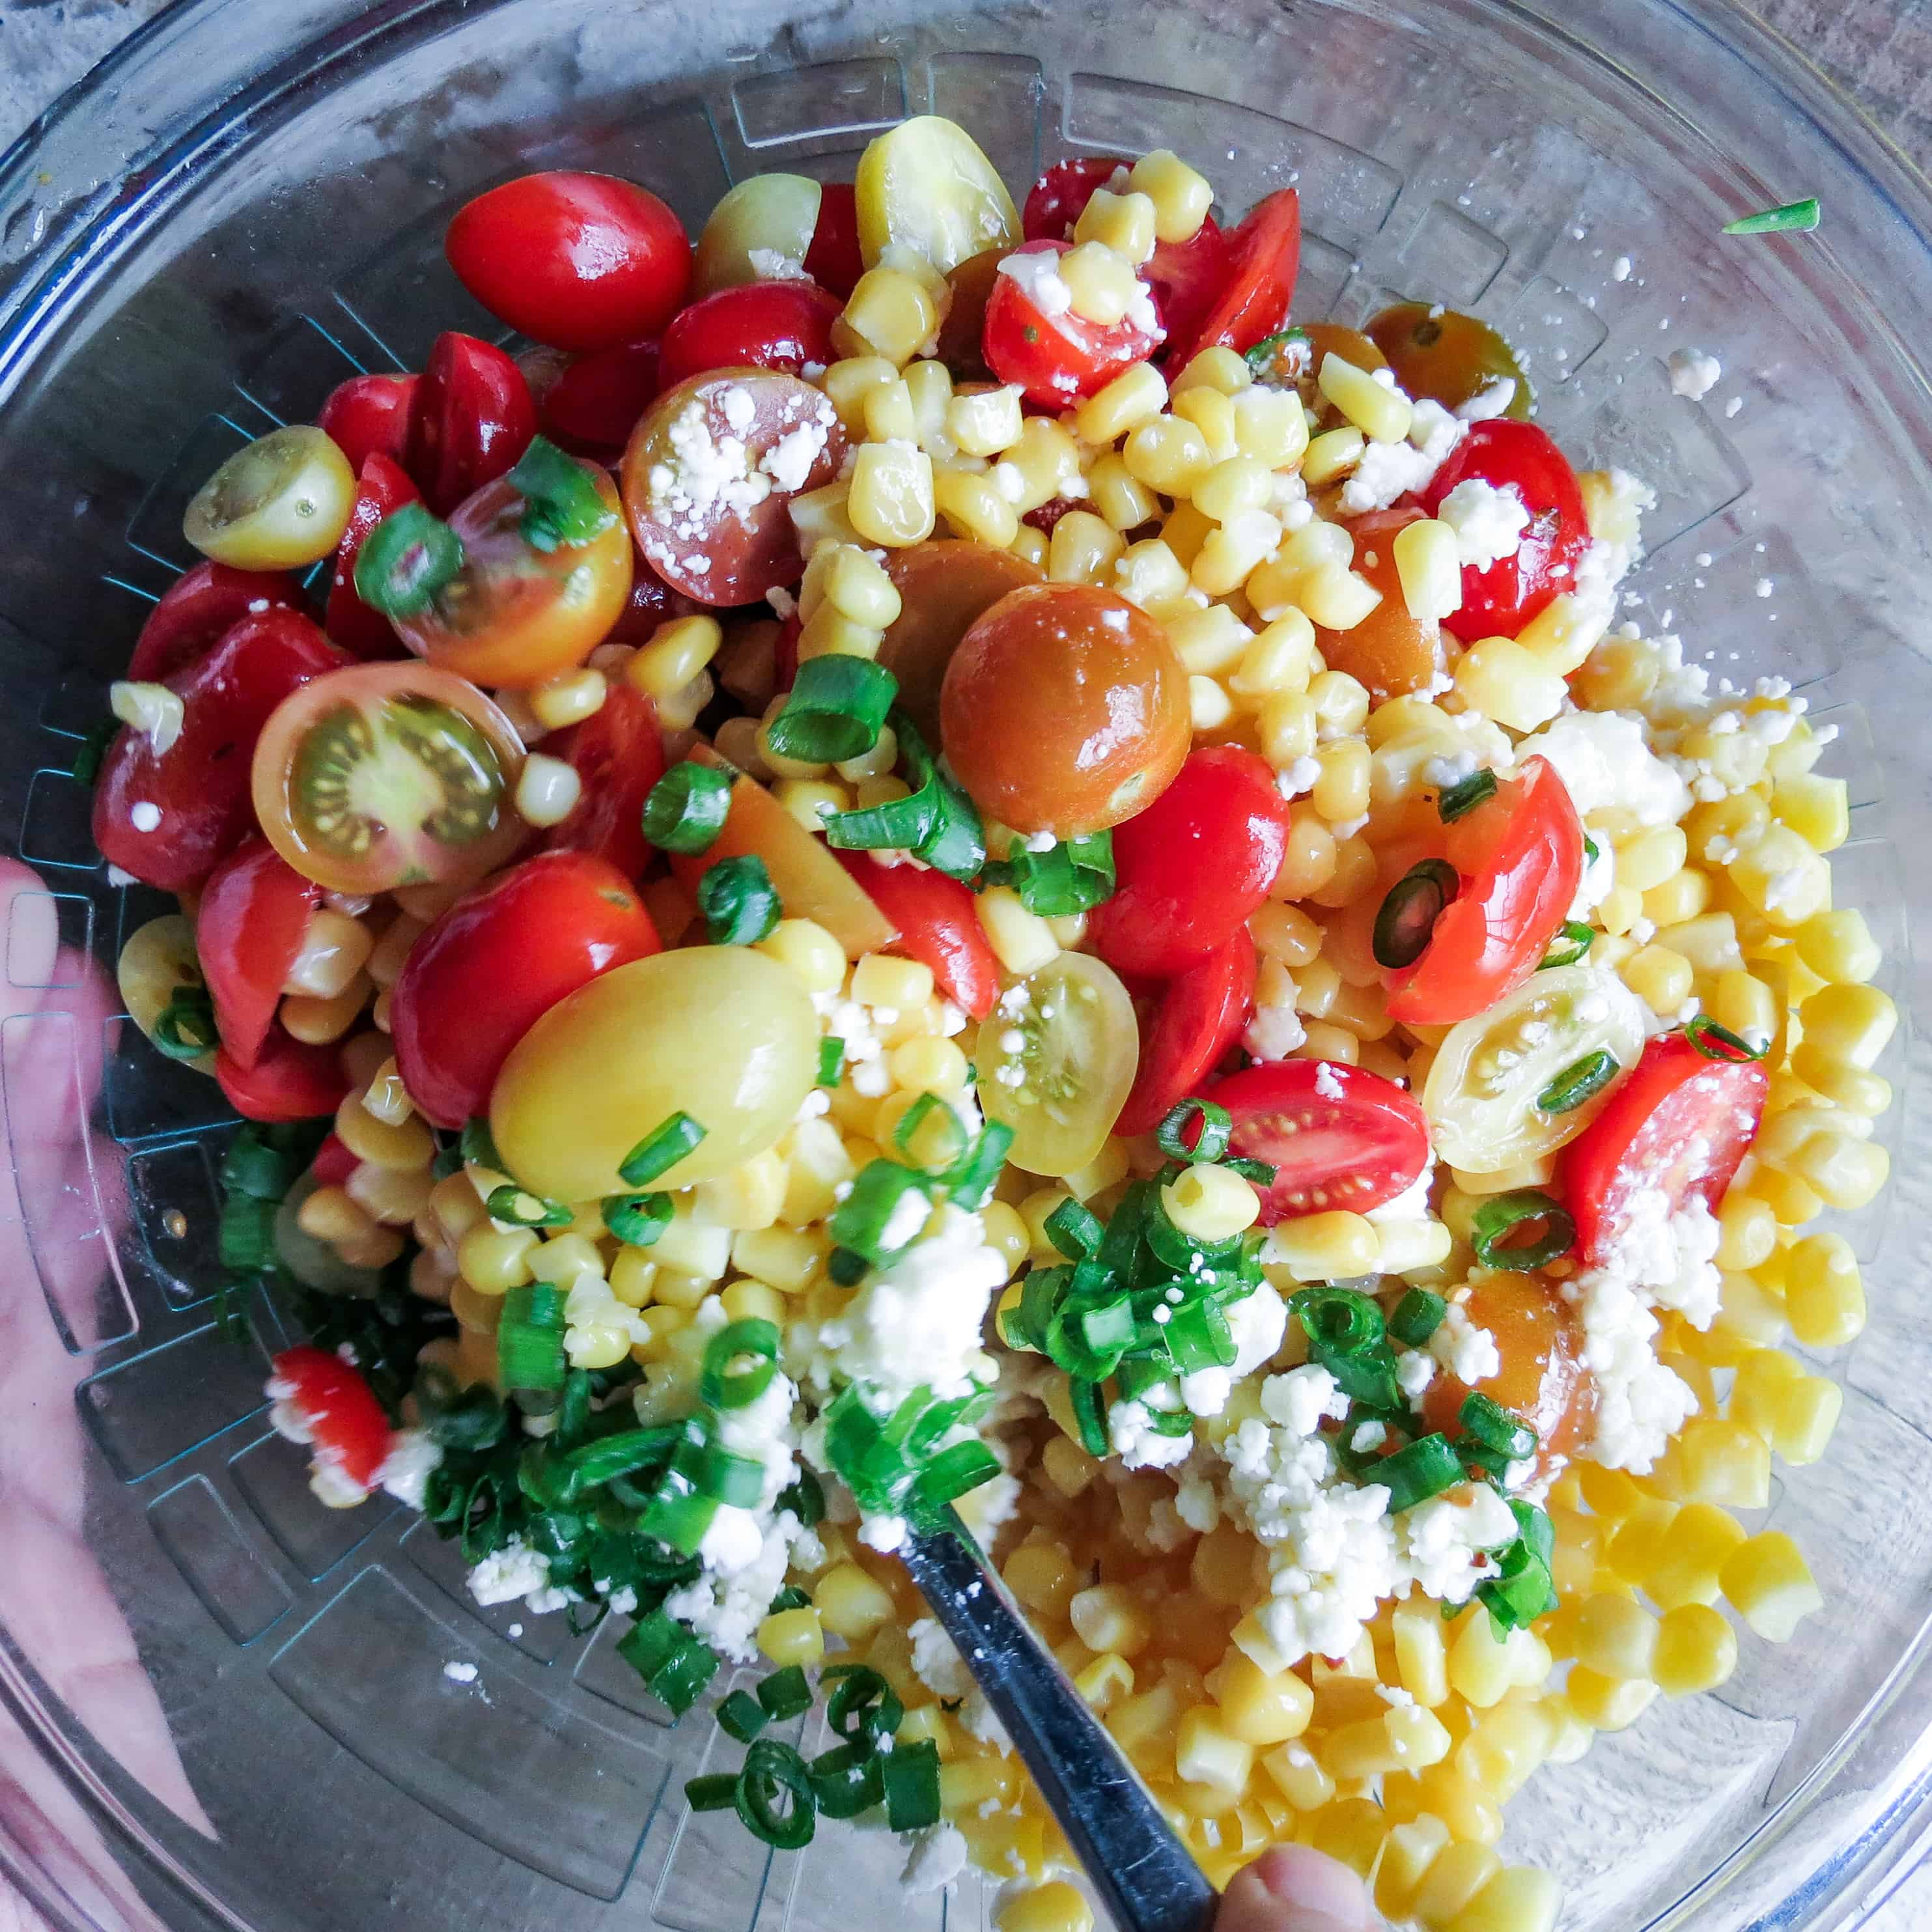 Corn Salad With Tomatoes